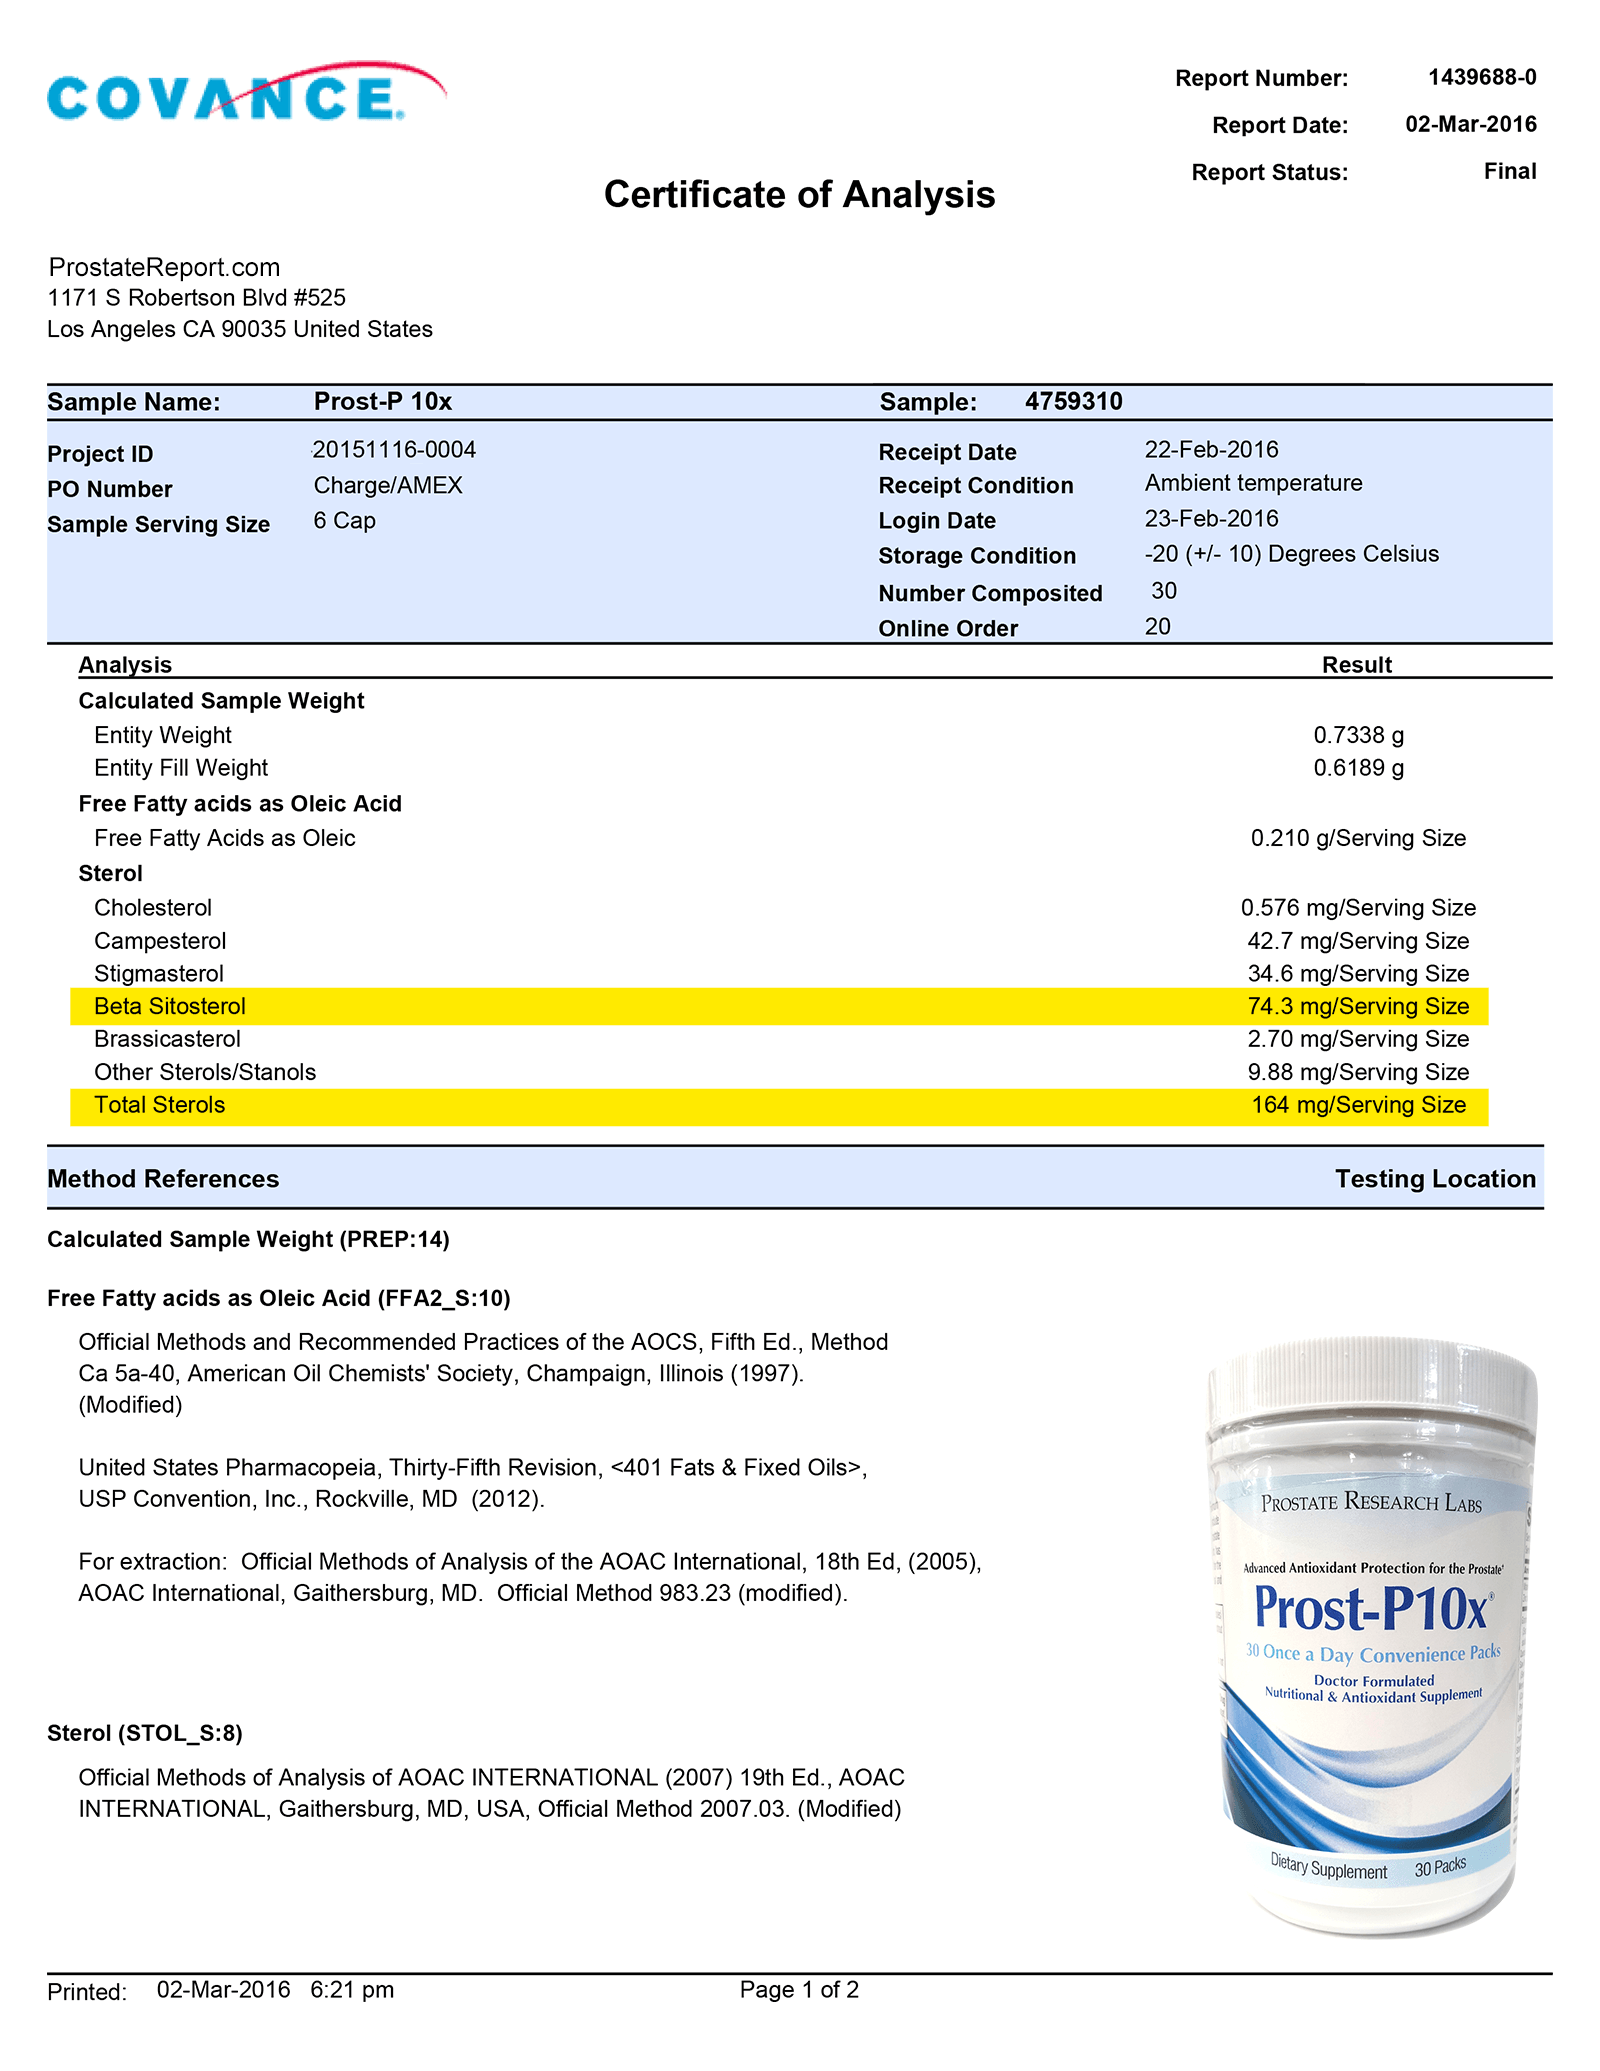 Prost P 10x lab report